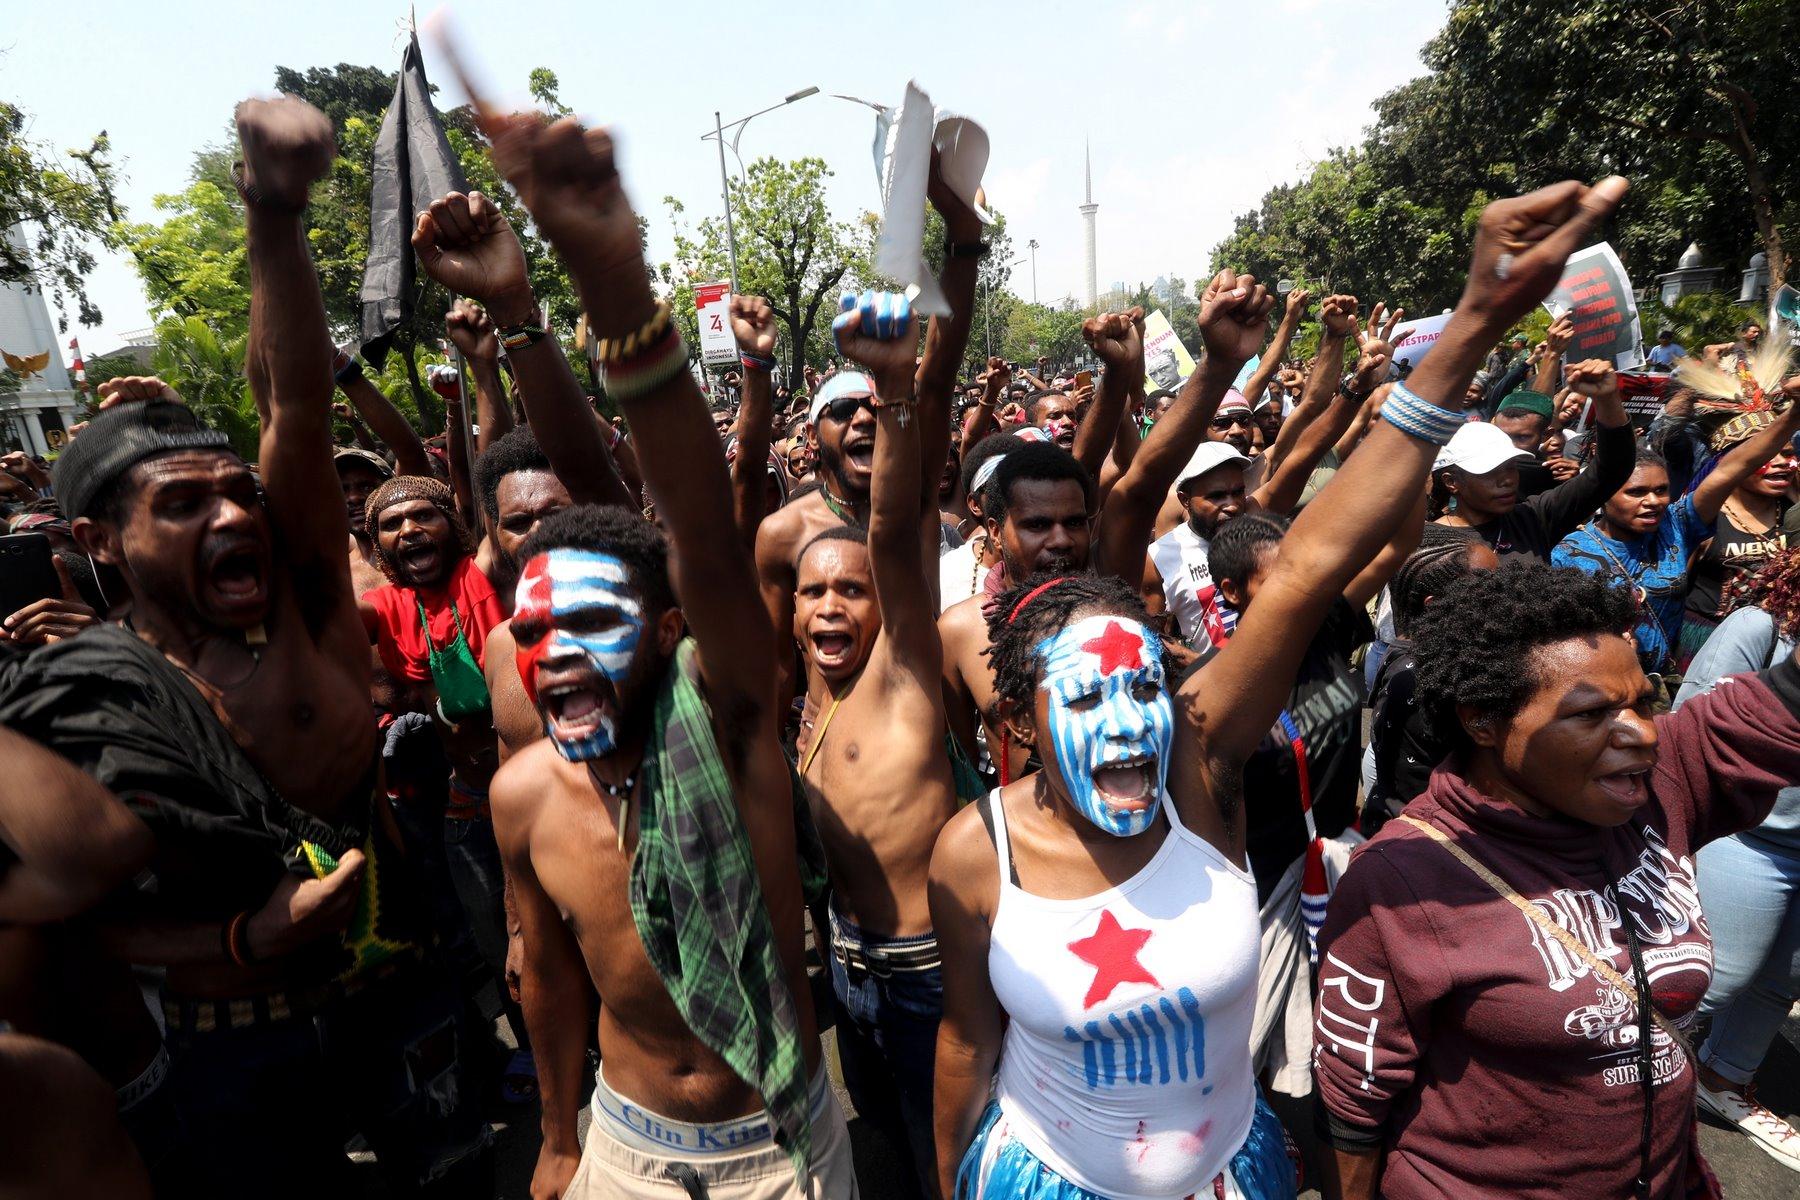 West Papua — Australia's new Timor-Leste?